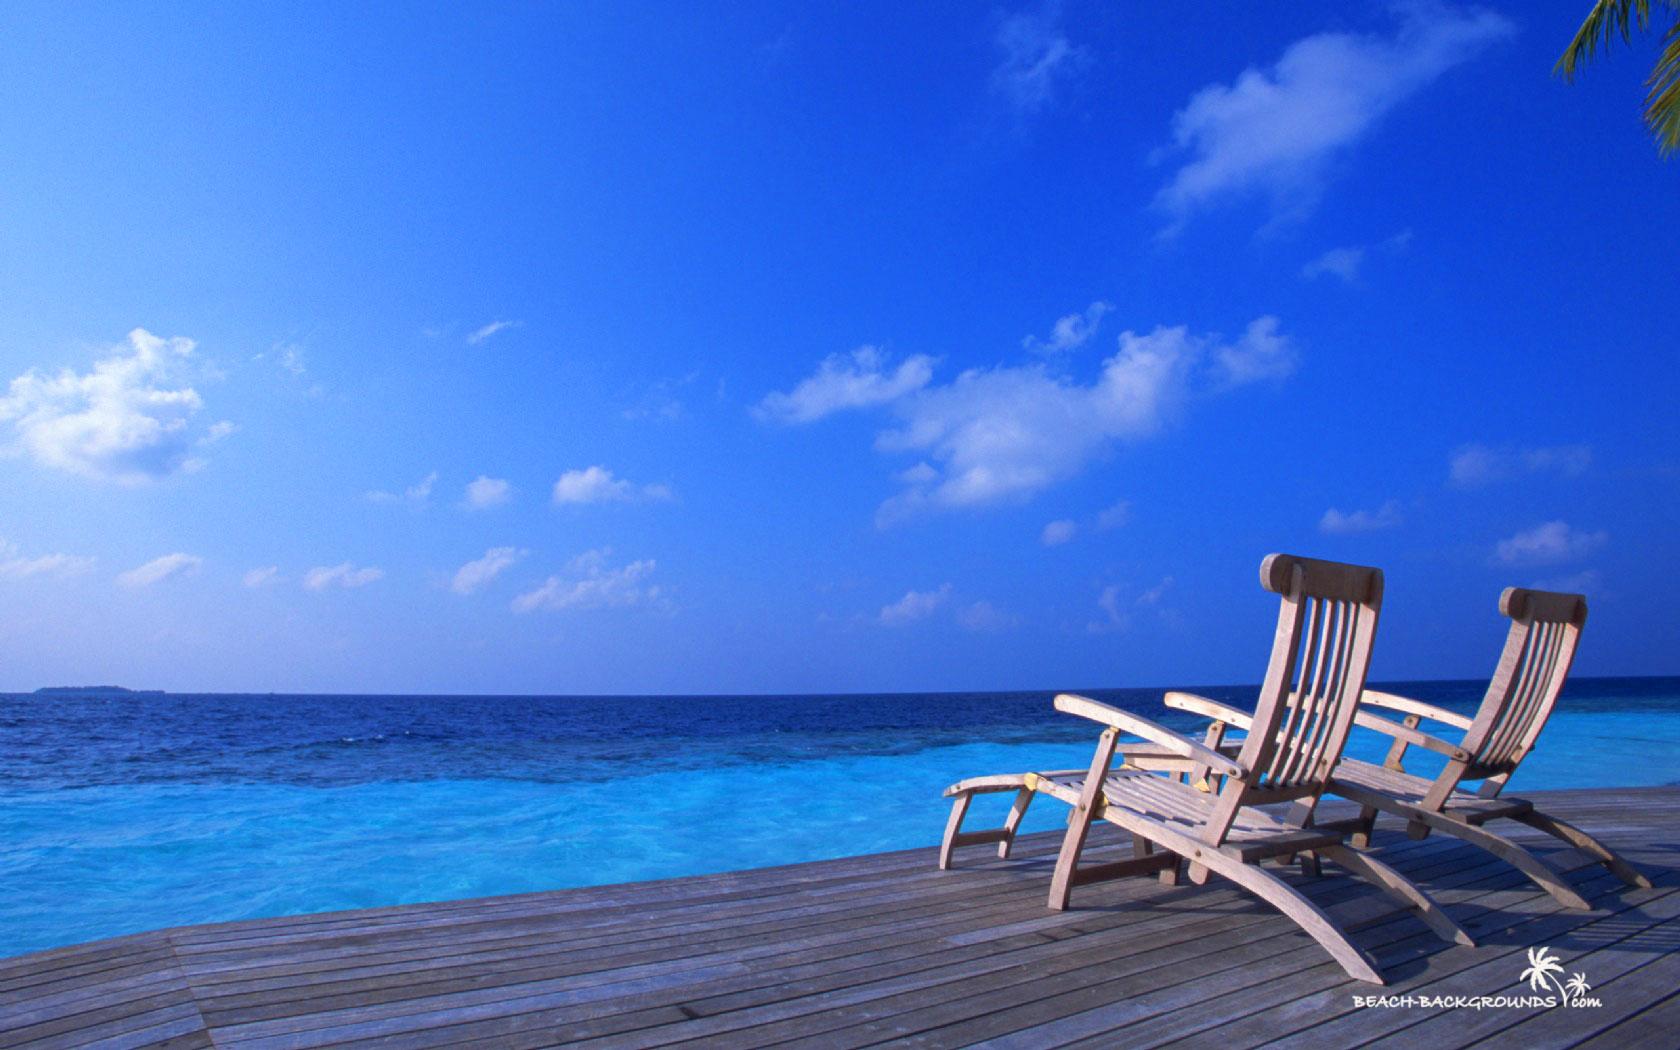 Relax On Tropical Beach - Relax On Tropical Beach